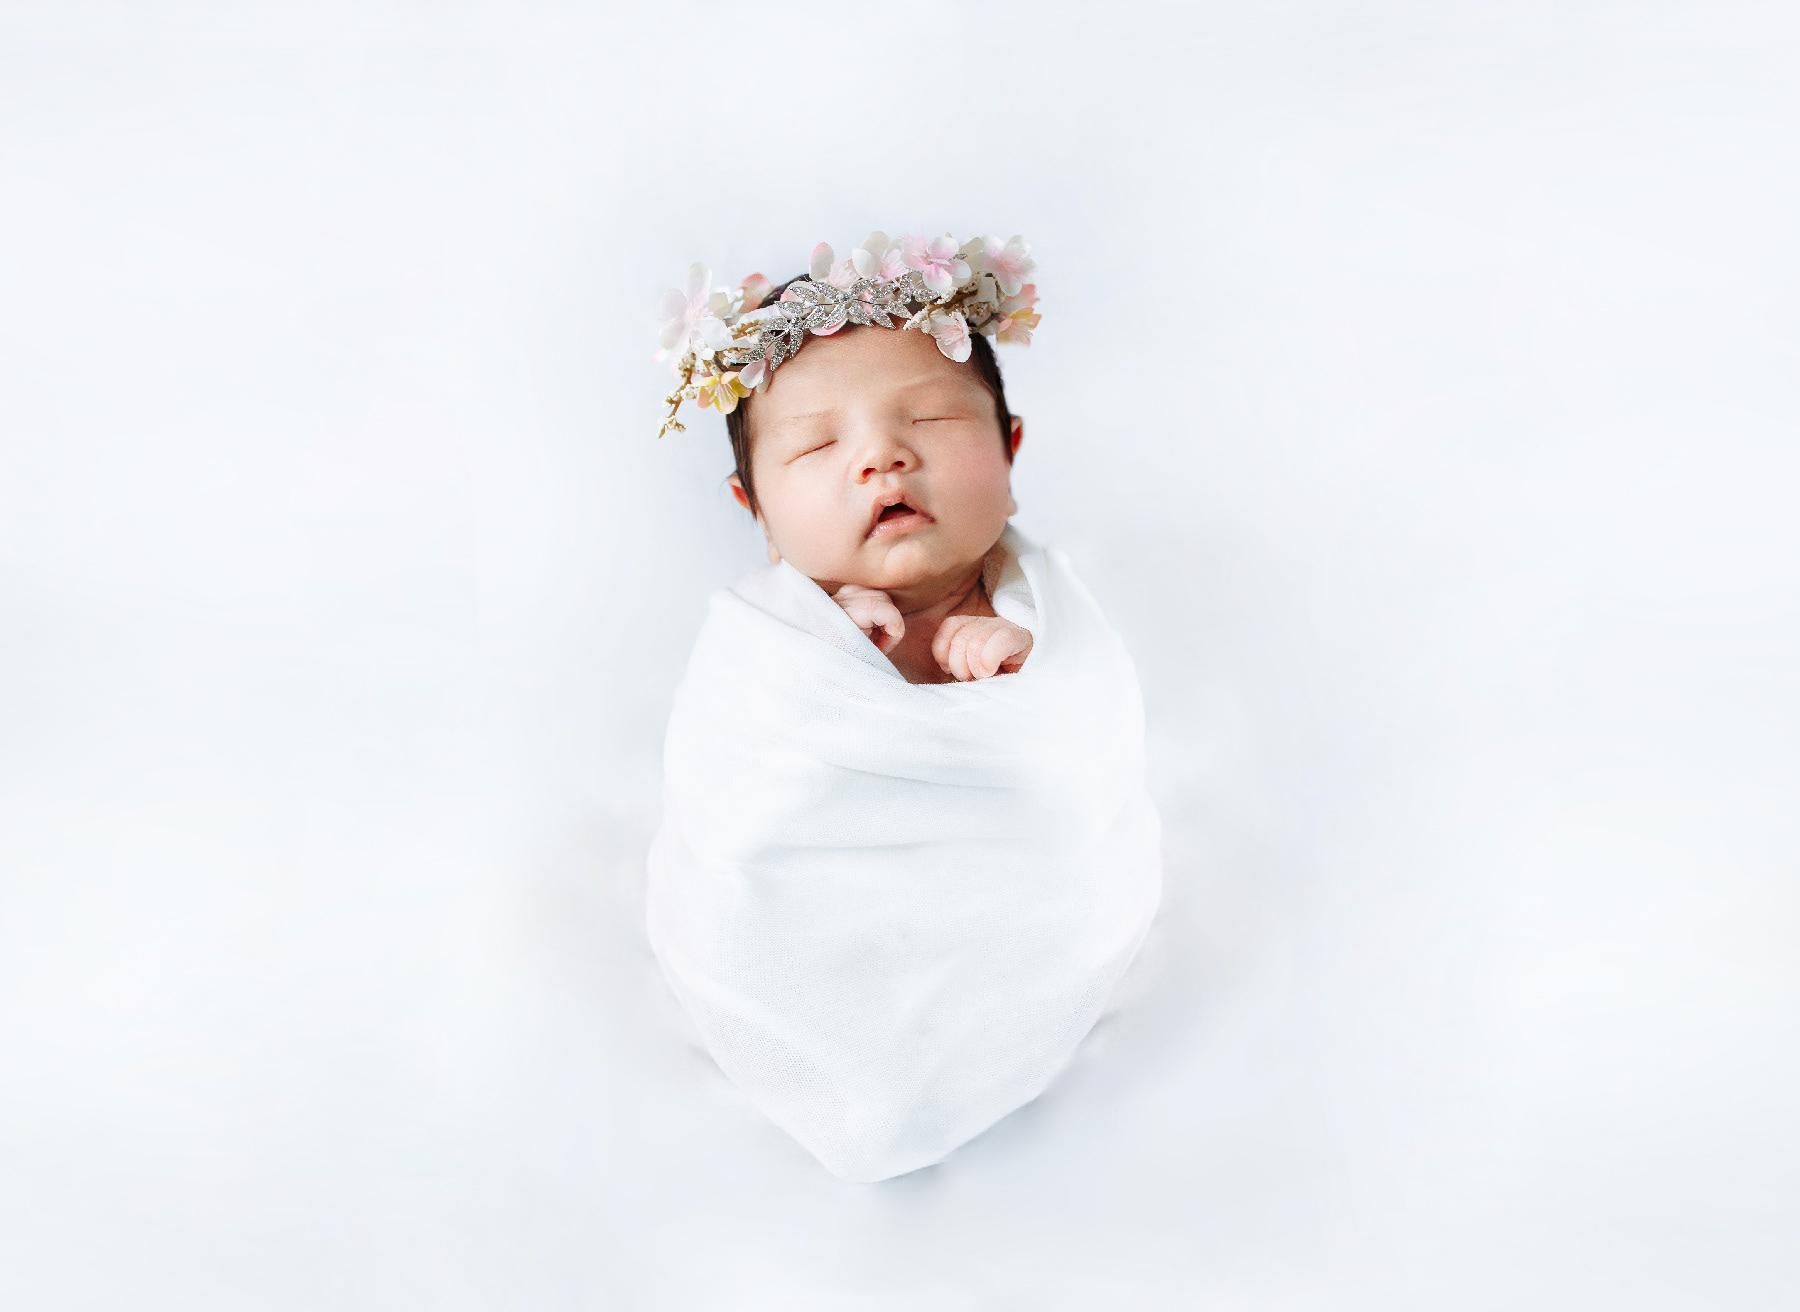 Newborn Photographer NJ - Artfitnessflow Photography - Elegant ...